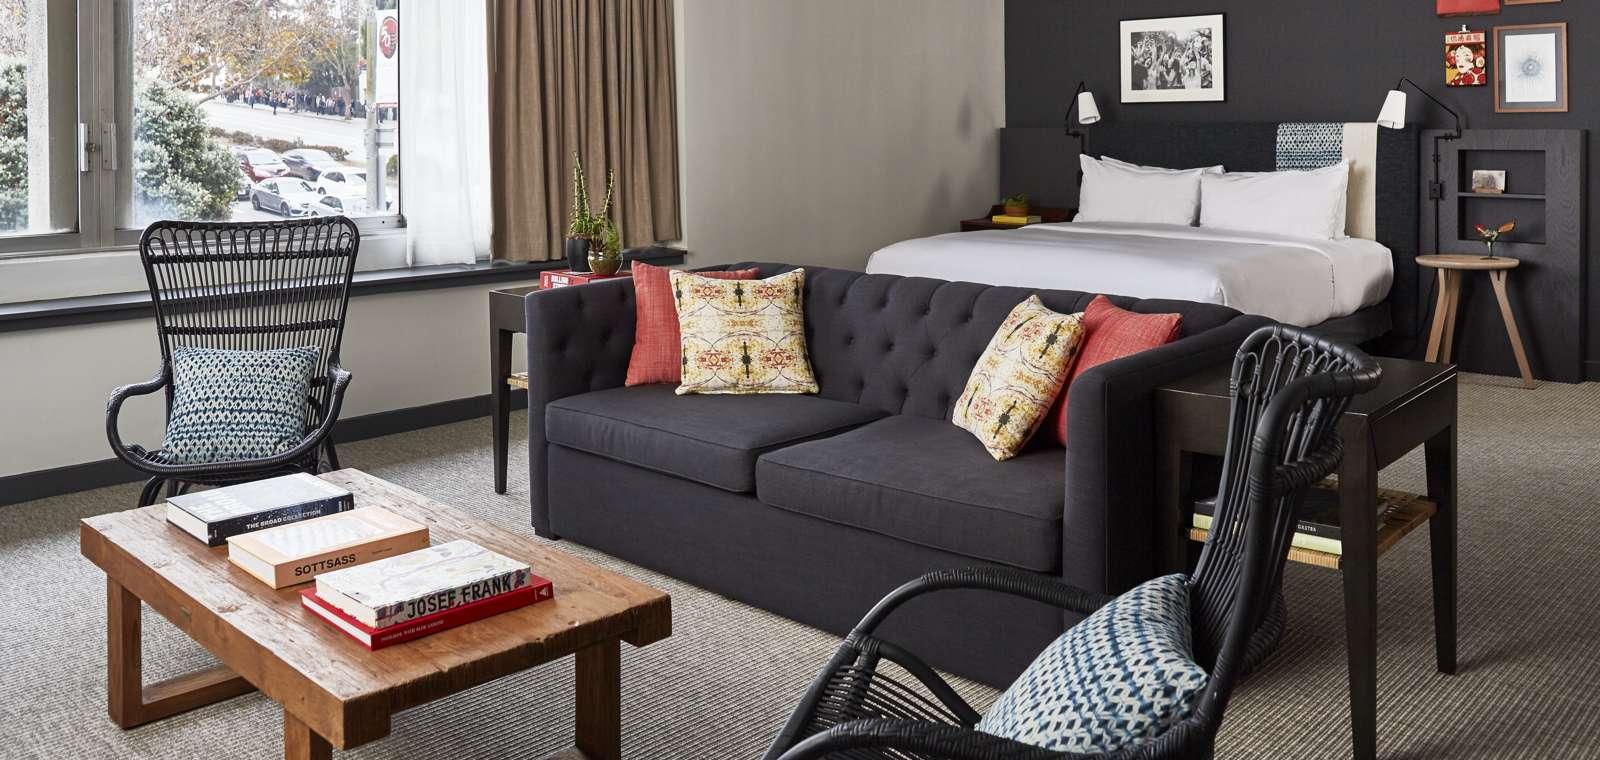 HotelKabuki_Rooms_Consulate_Deluxe_King